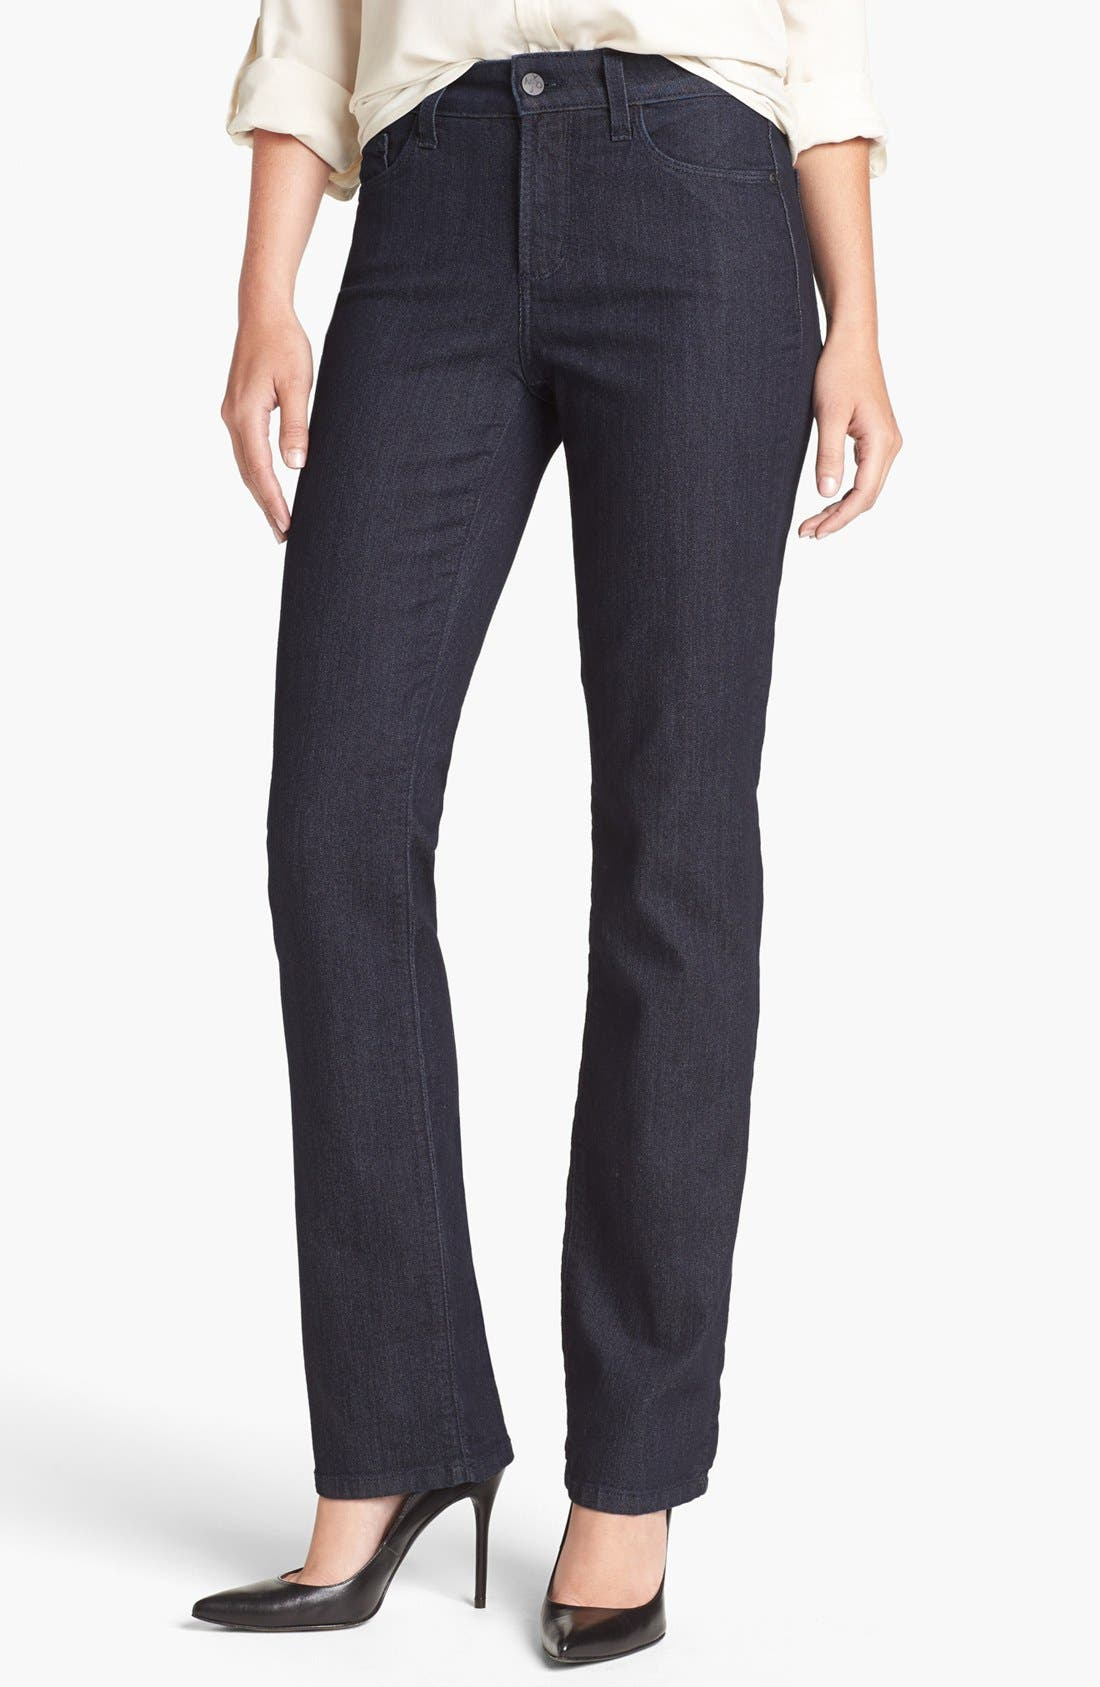 Main Image - NYDJ 'Marilyn' Embellished Pocket Straight Leg Jeans